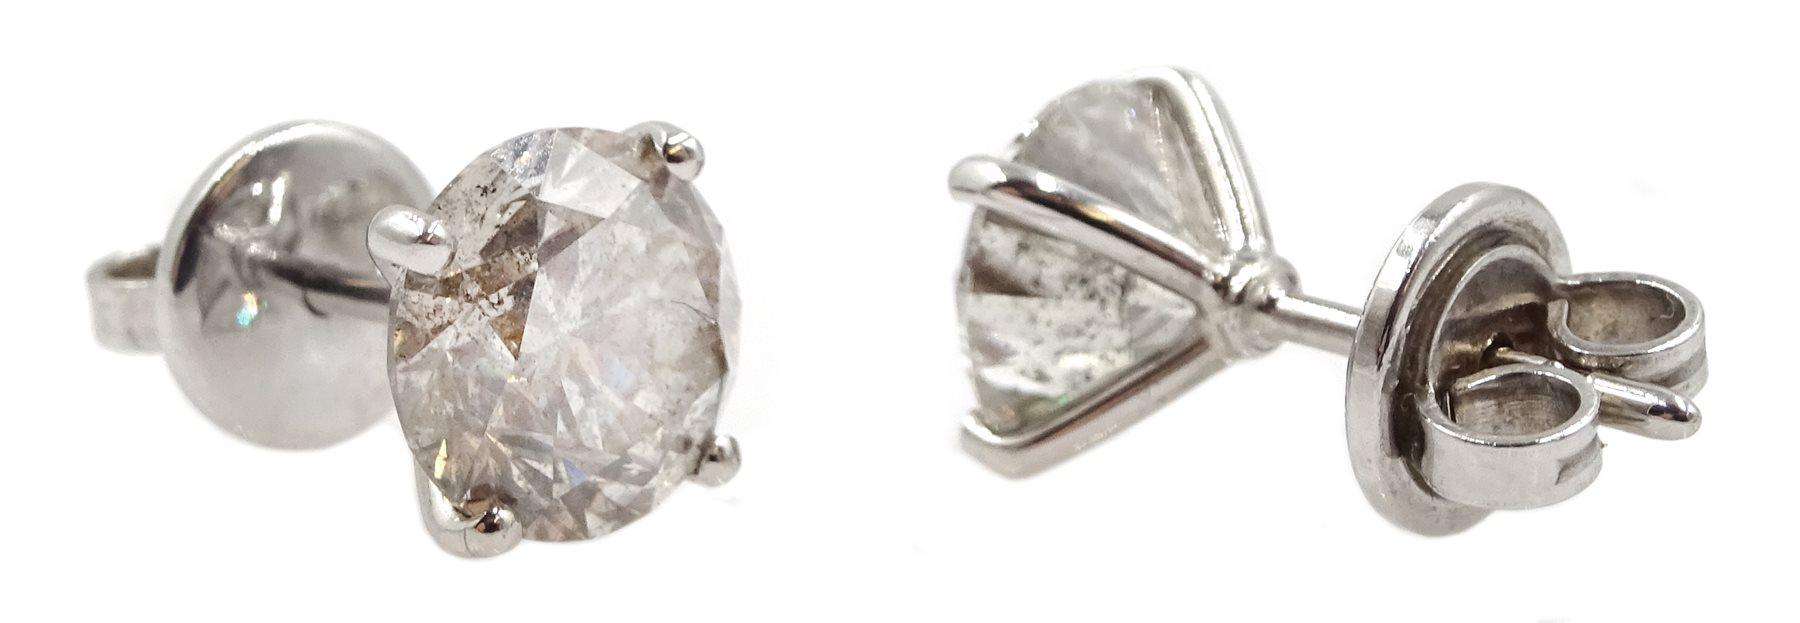 Pair of 18ct white gold diamond stud earrings, stamped 750, diamond total weight 3.52 carat, free UK - Image 2 of 4